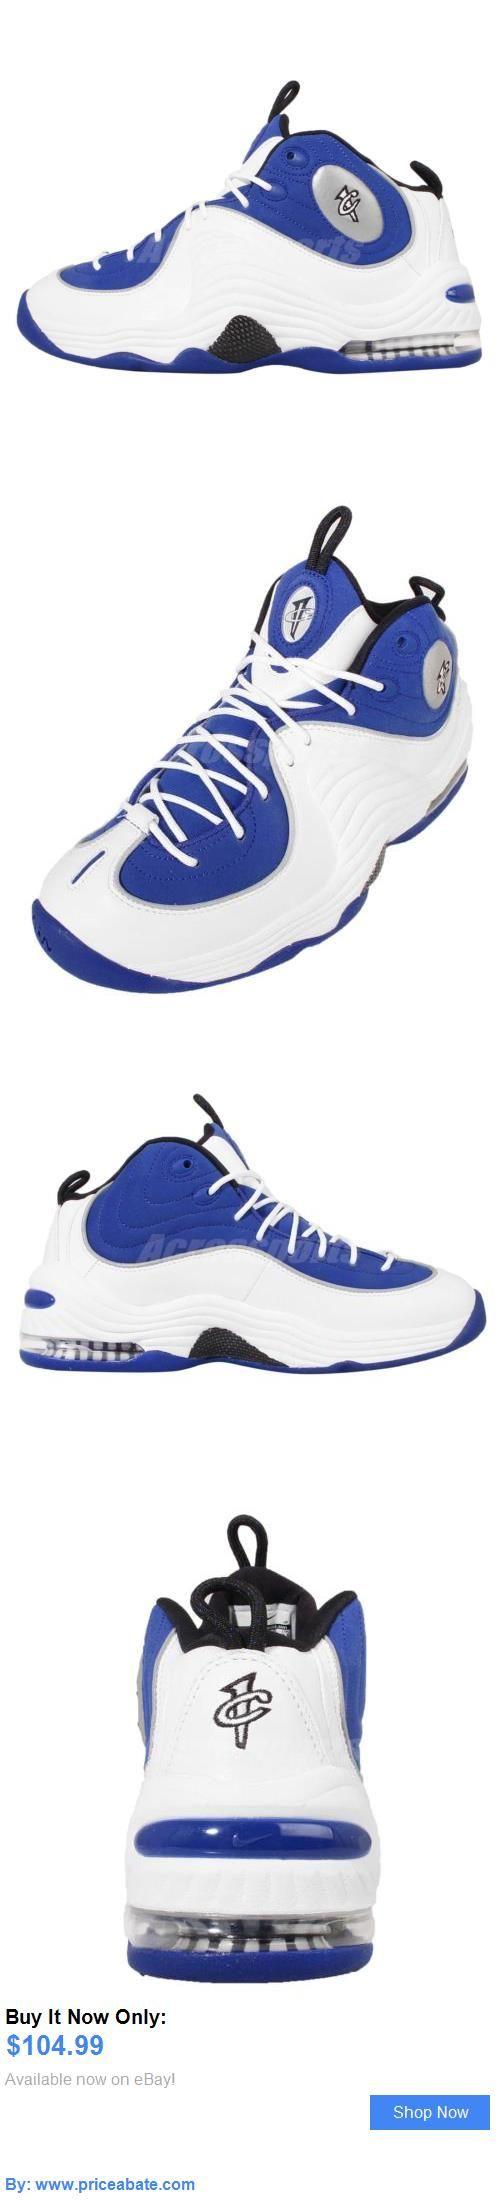 Basketball: Nike Air Penny Ii 2 Atlantic Blue Hardaway Mens Basketball  Shoes 333886-400